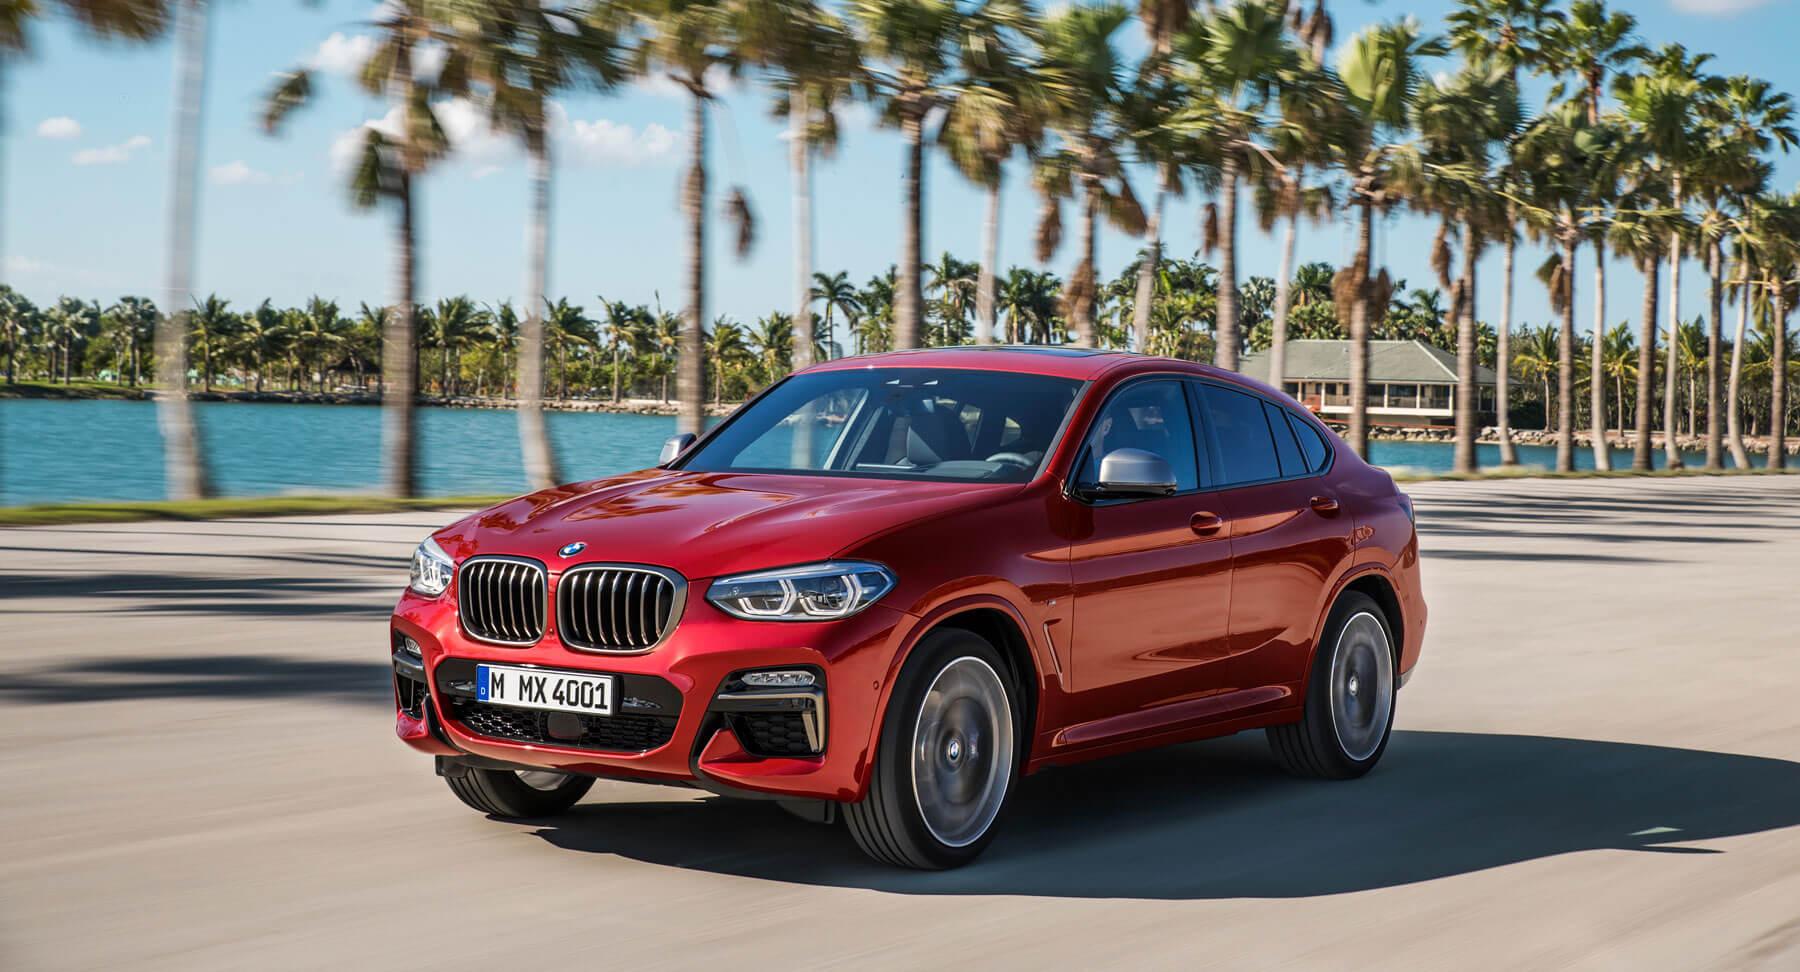 El BMW X4 2018 acentúa la línea cupé